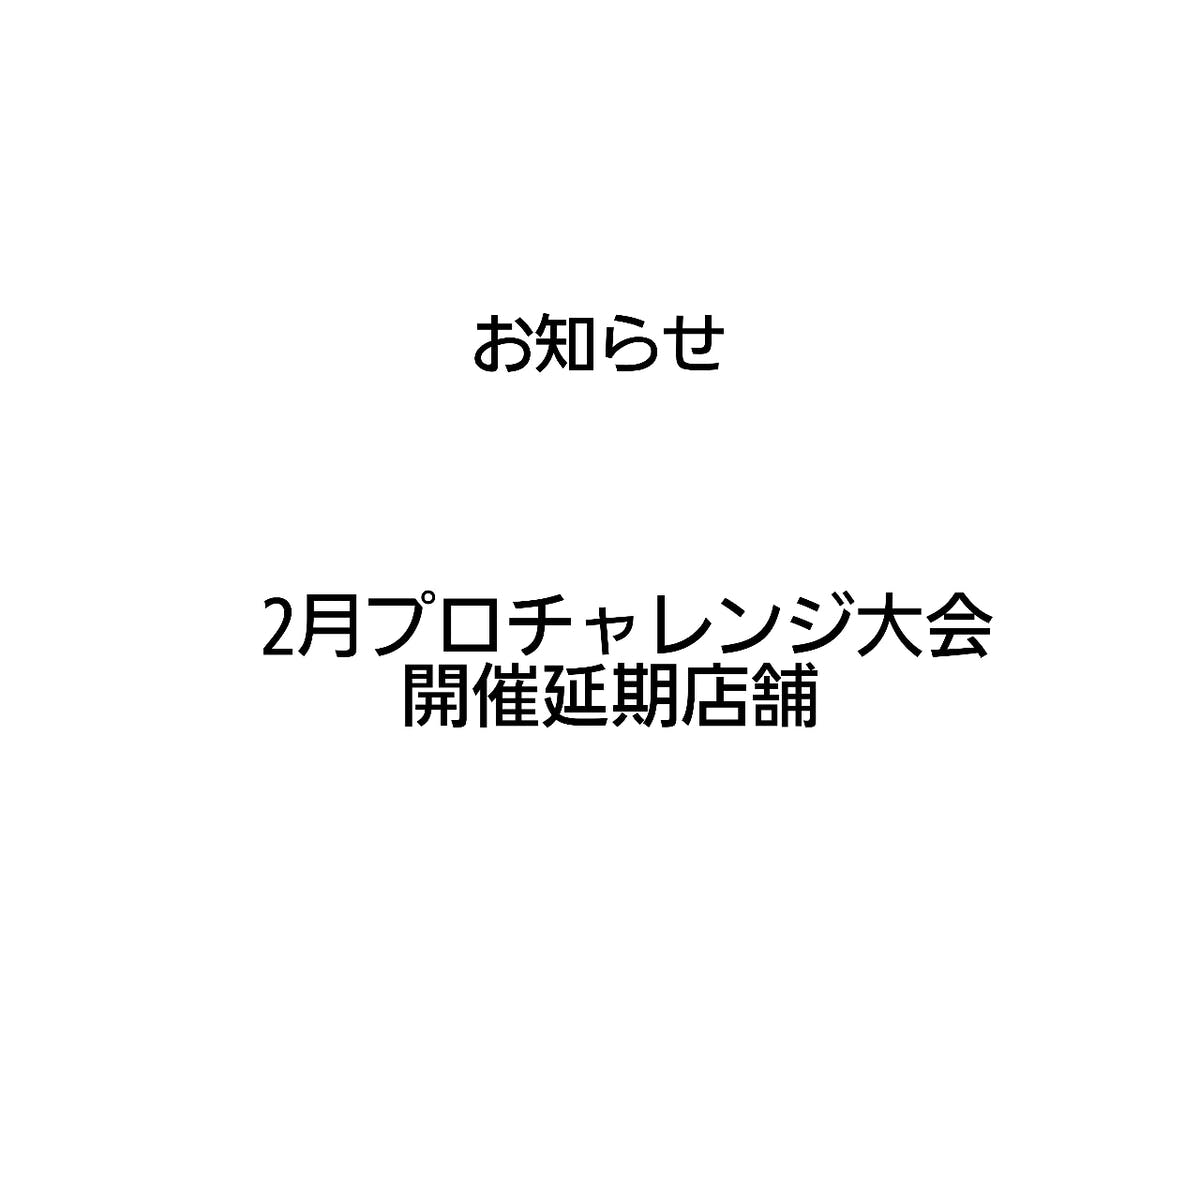 21-02-06-12-50-58-384_deco.jpg